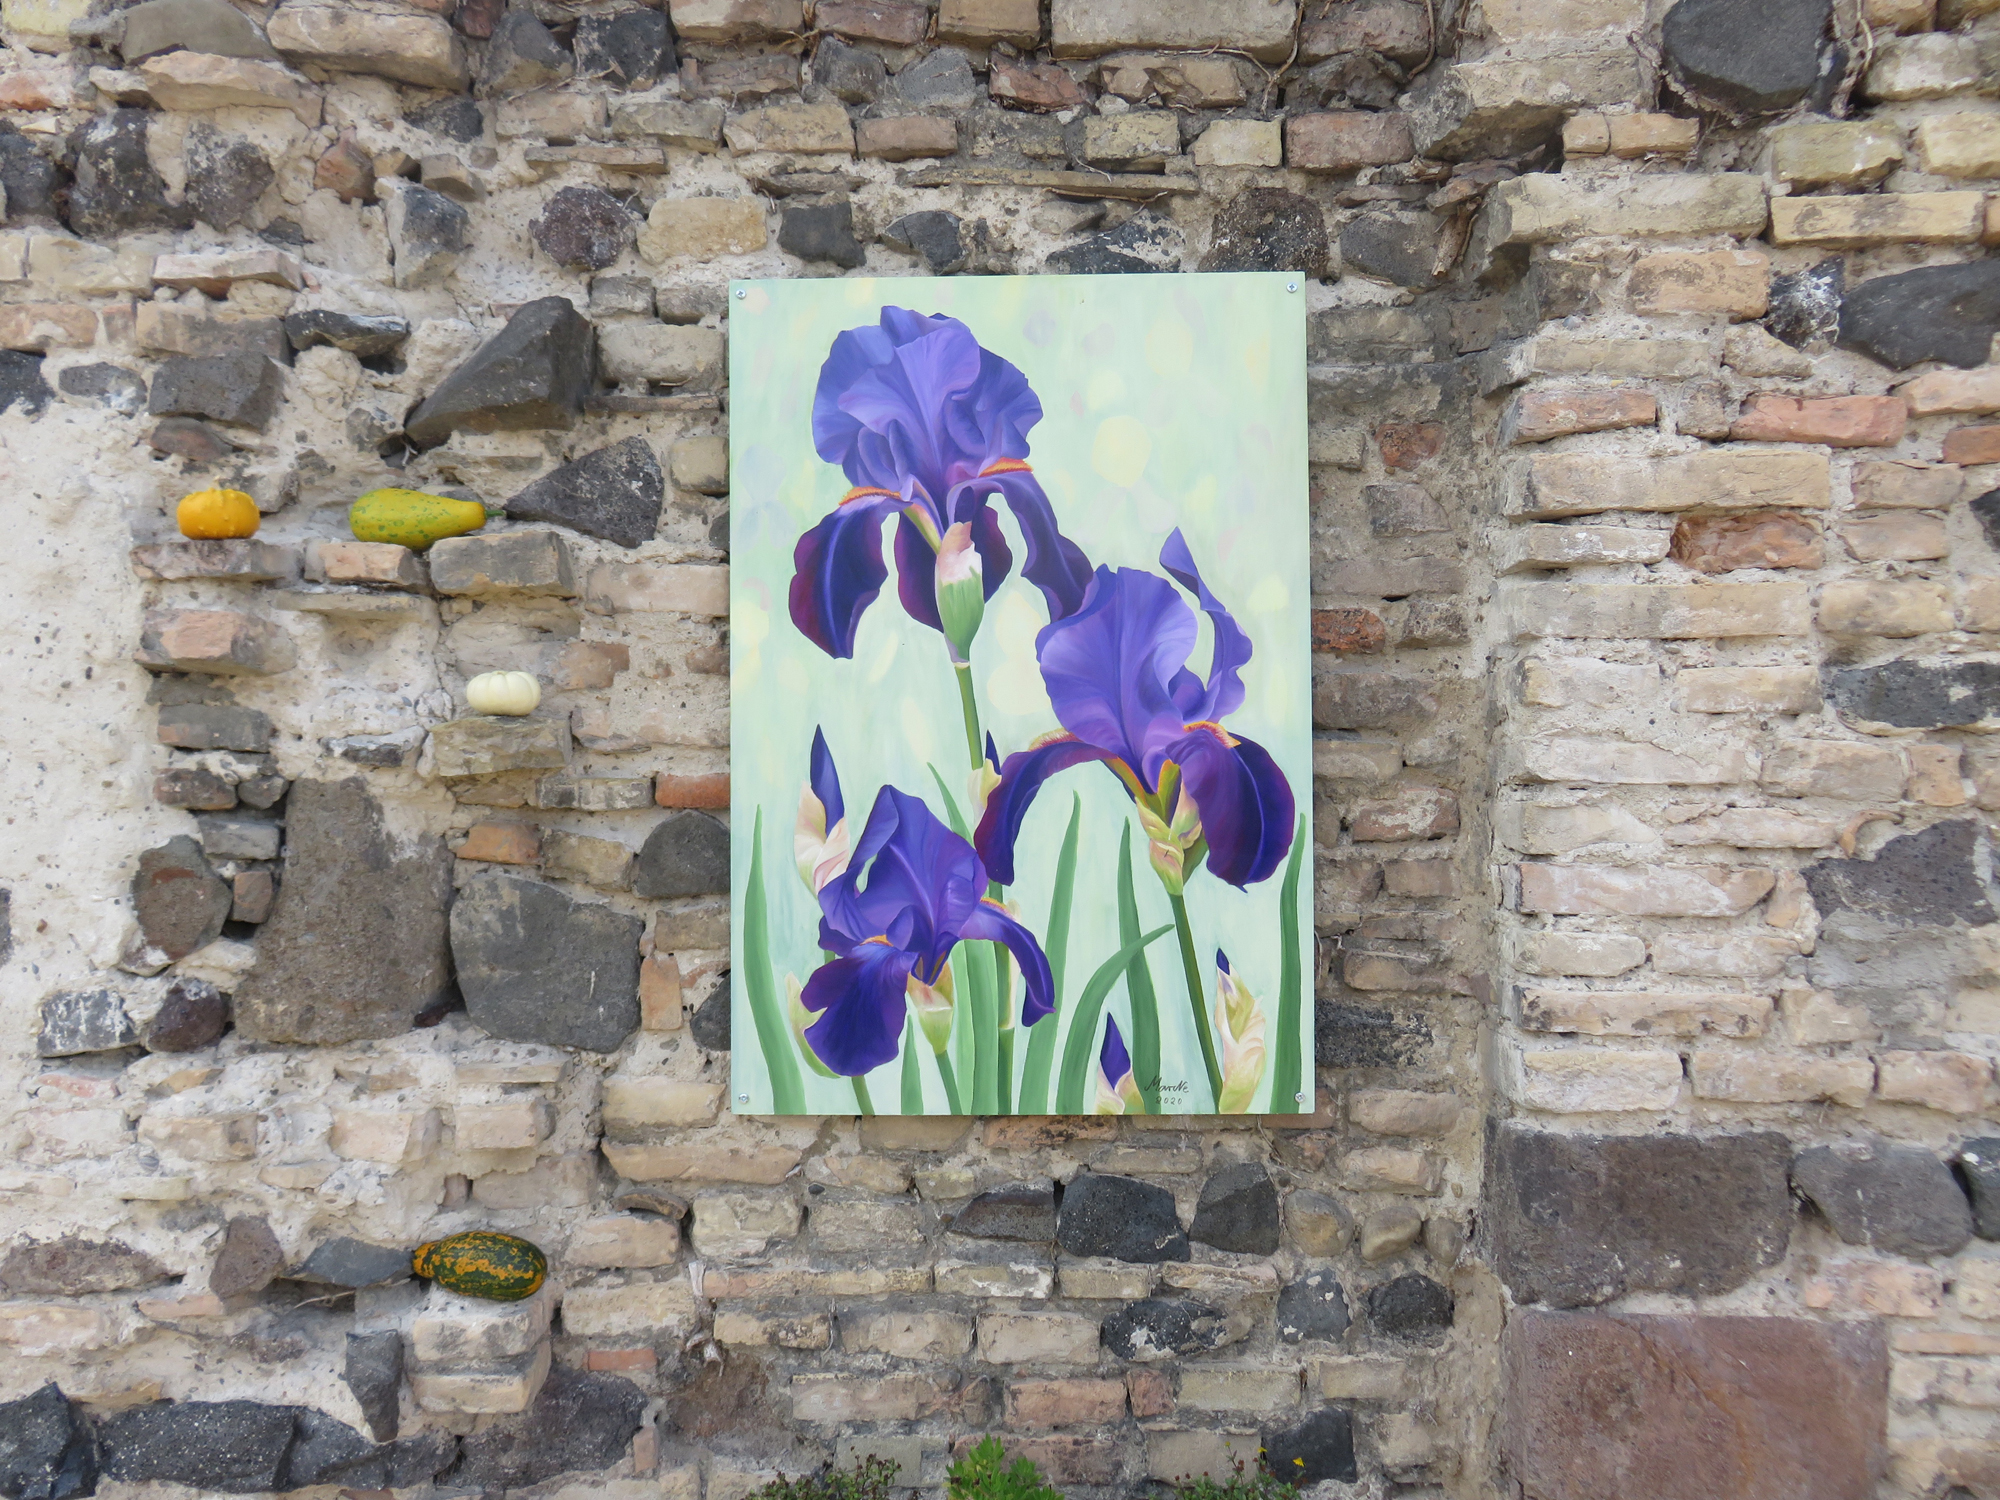 "Marita Brettschneider: Iris germanica   Klostergarten   <a href=""https://www.marne-art.de"" target=""_blank"">www.marne-art.de</a>"